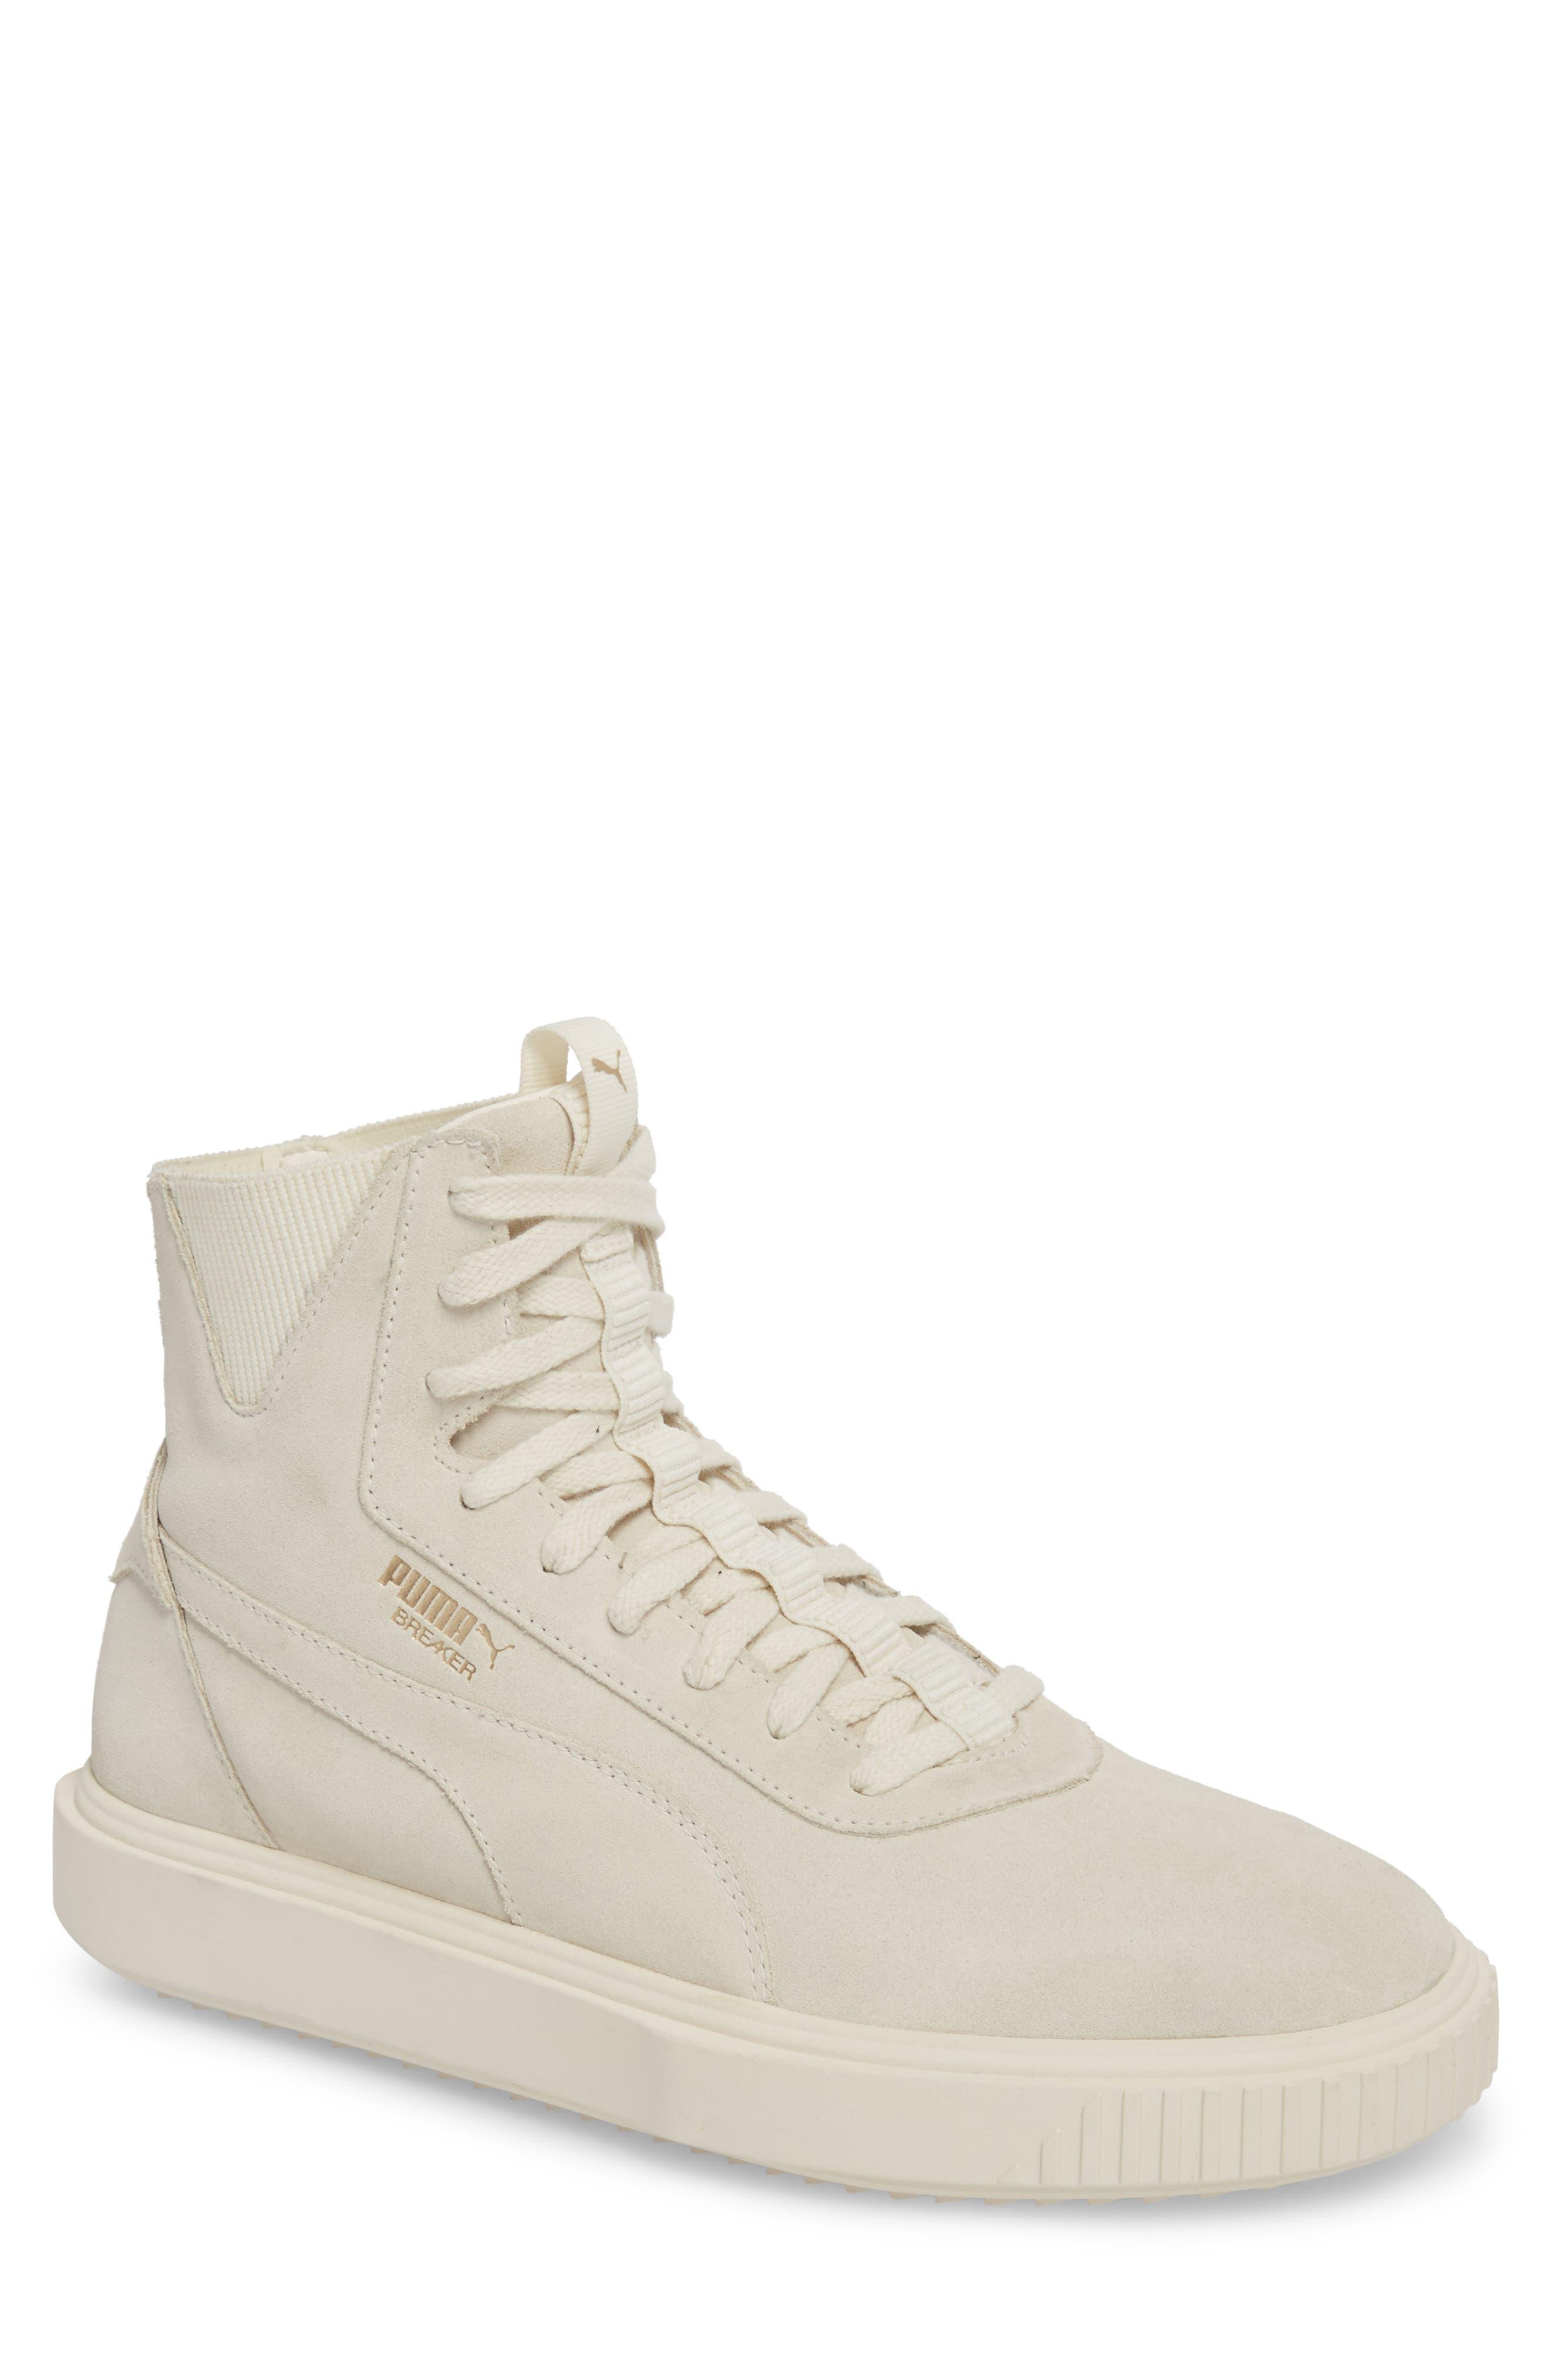 Breaker High Top Sneaker,                         Main,                         color, WHITE